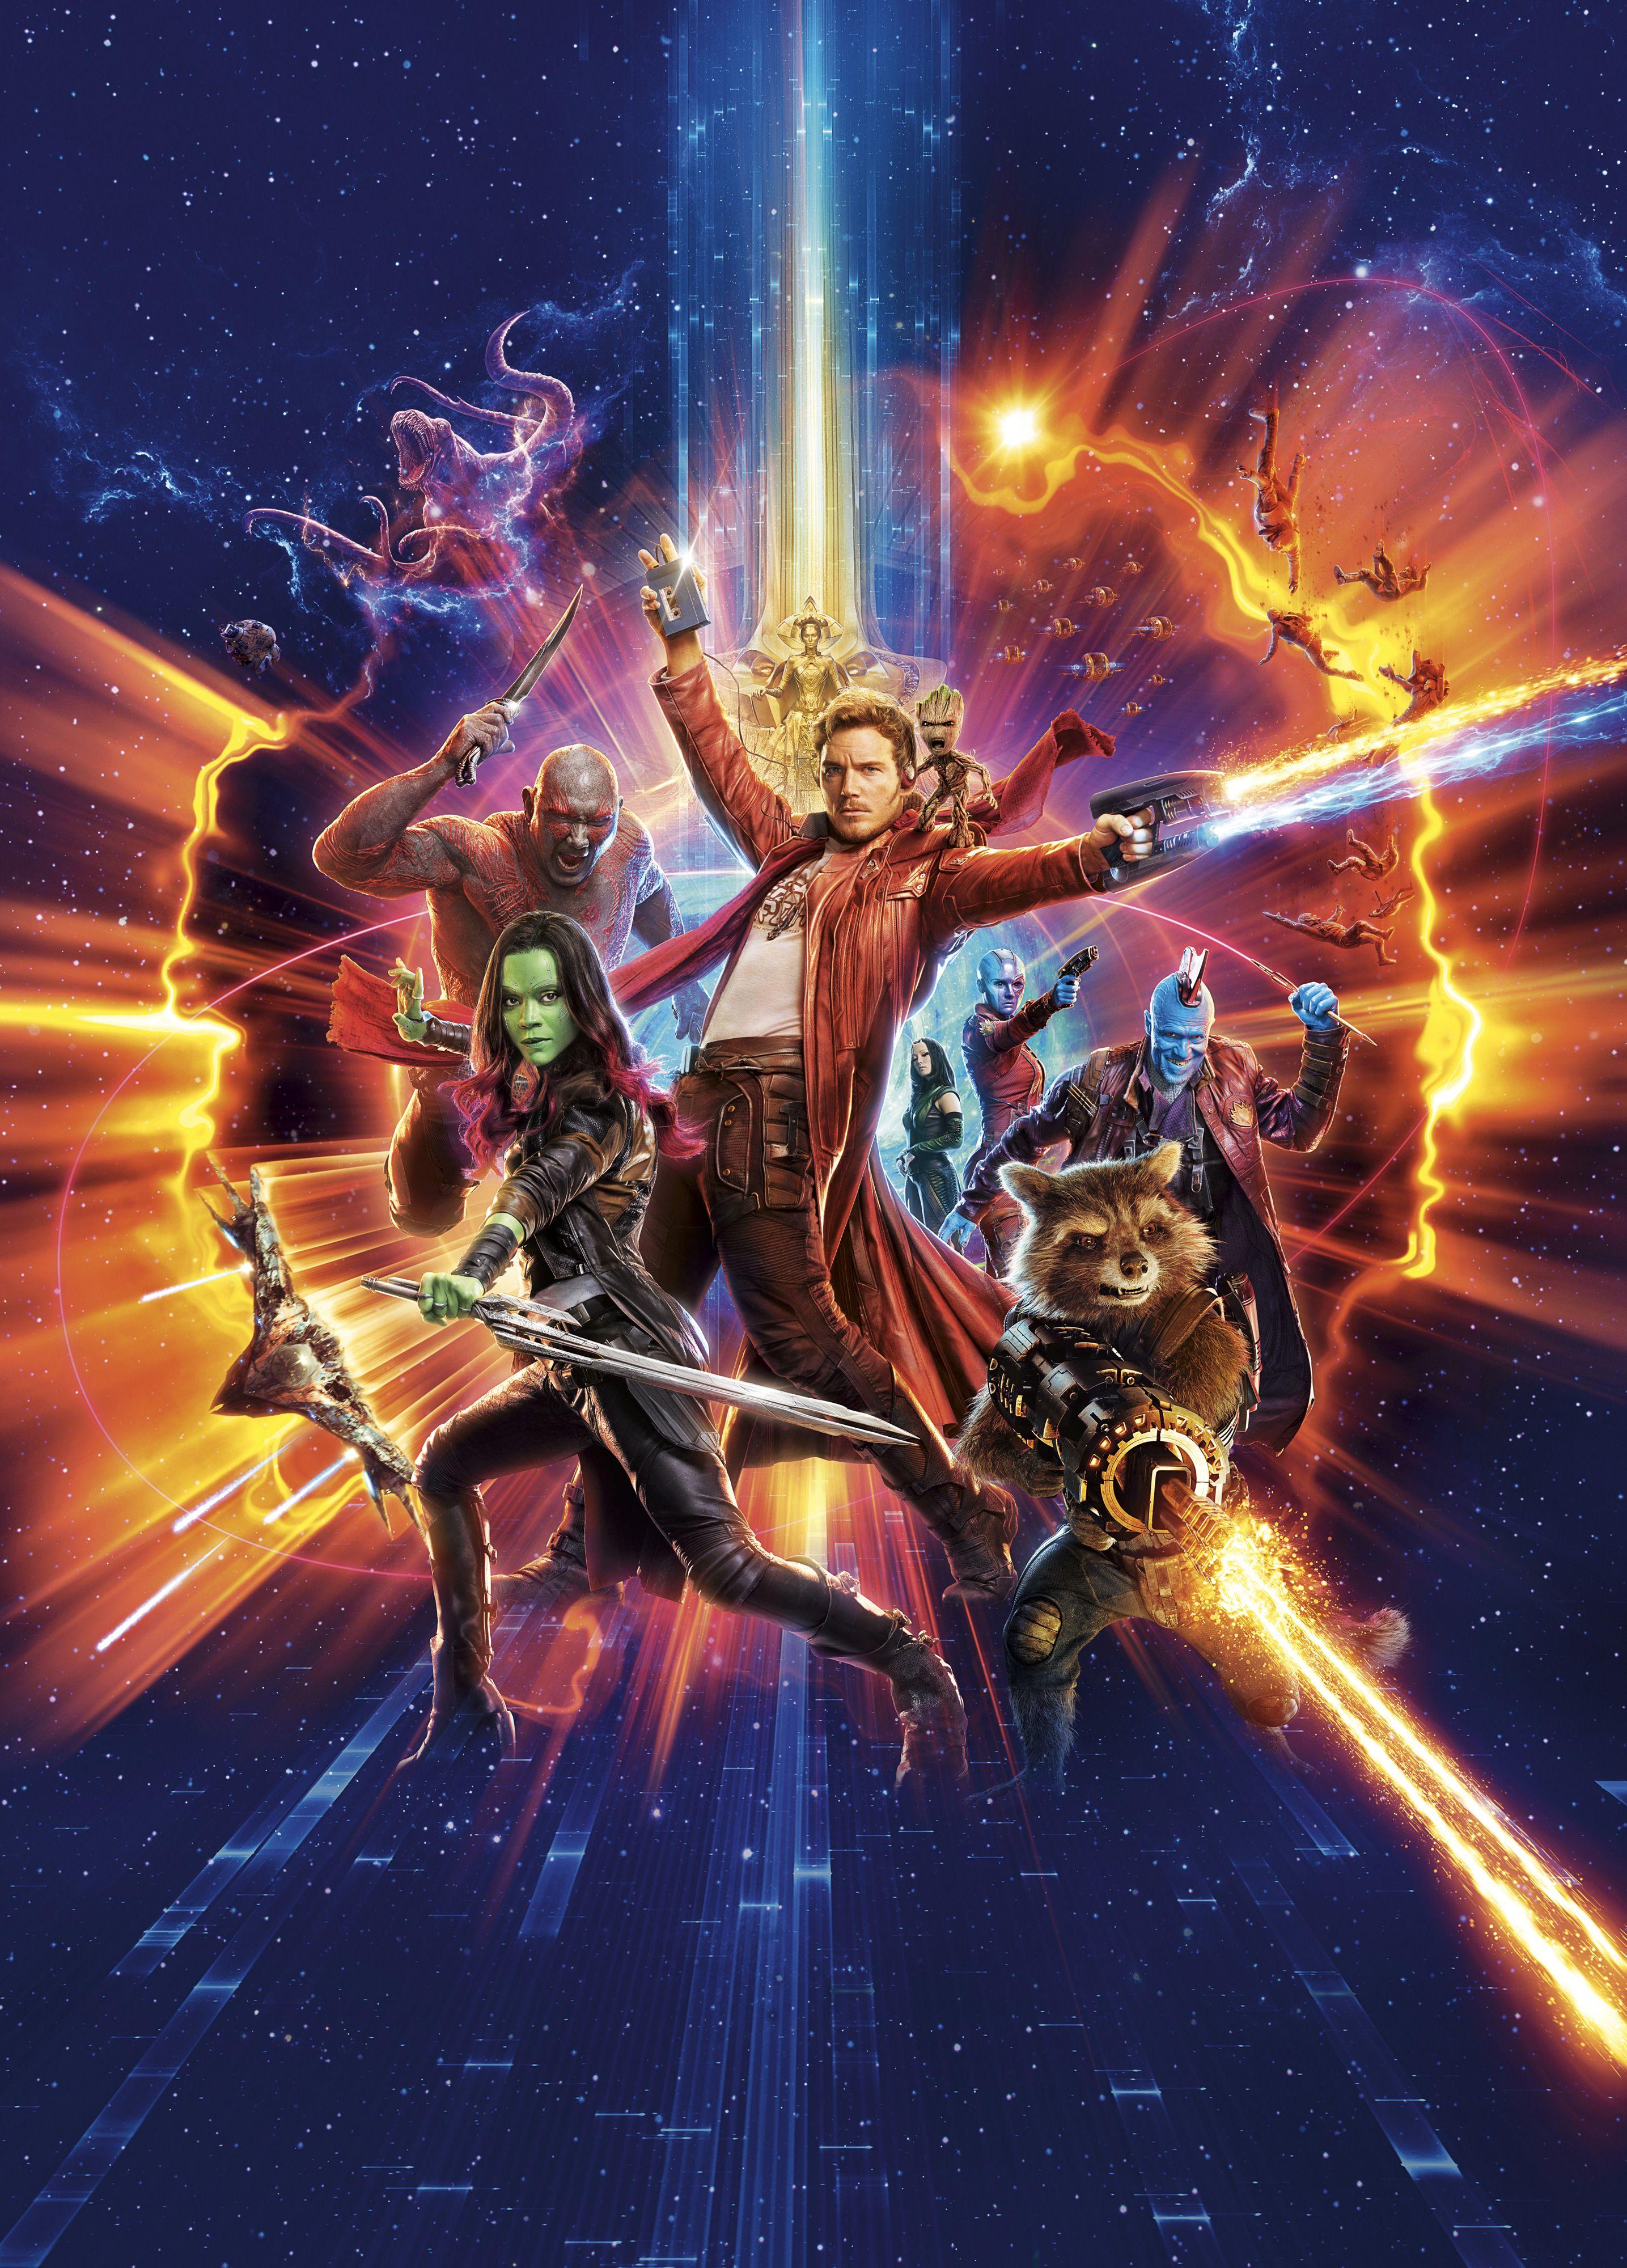 d2293150c guardiansofthegalaxy #movie #hd #avengers #endgame #marvel | Heróis ...